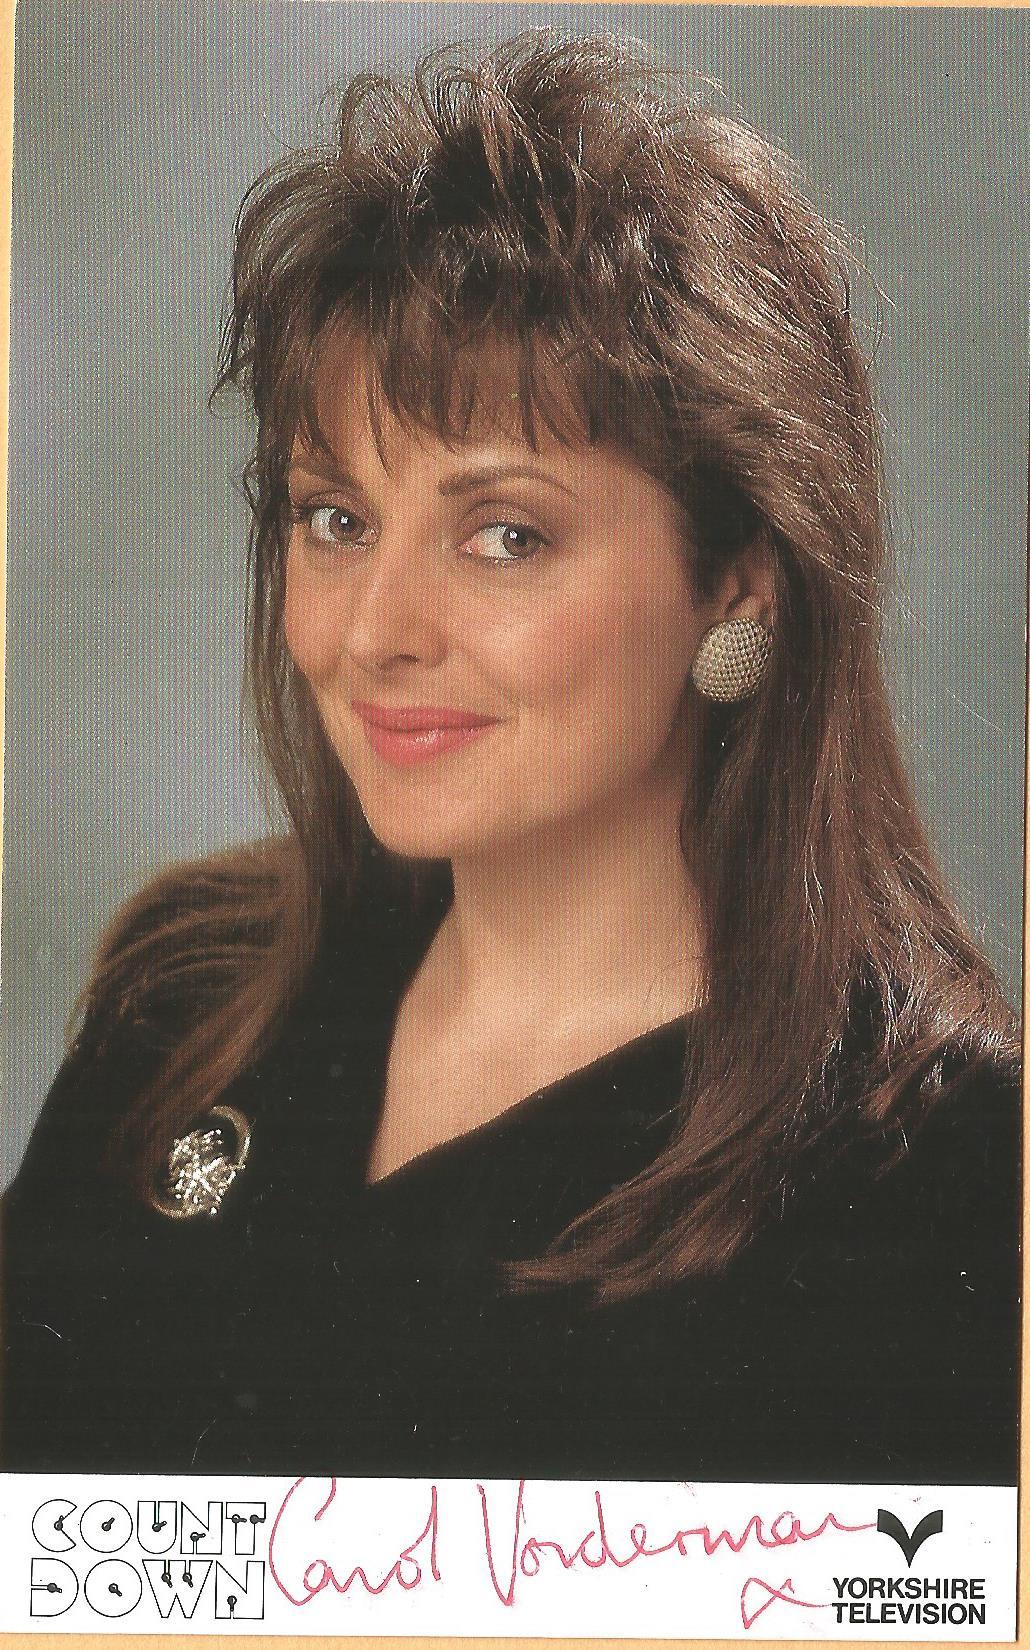 Carol Vorderman signed 6x4 colour photo. Carol Jean Vorderman, MBE (born 24 December 1960) is a